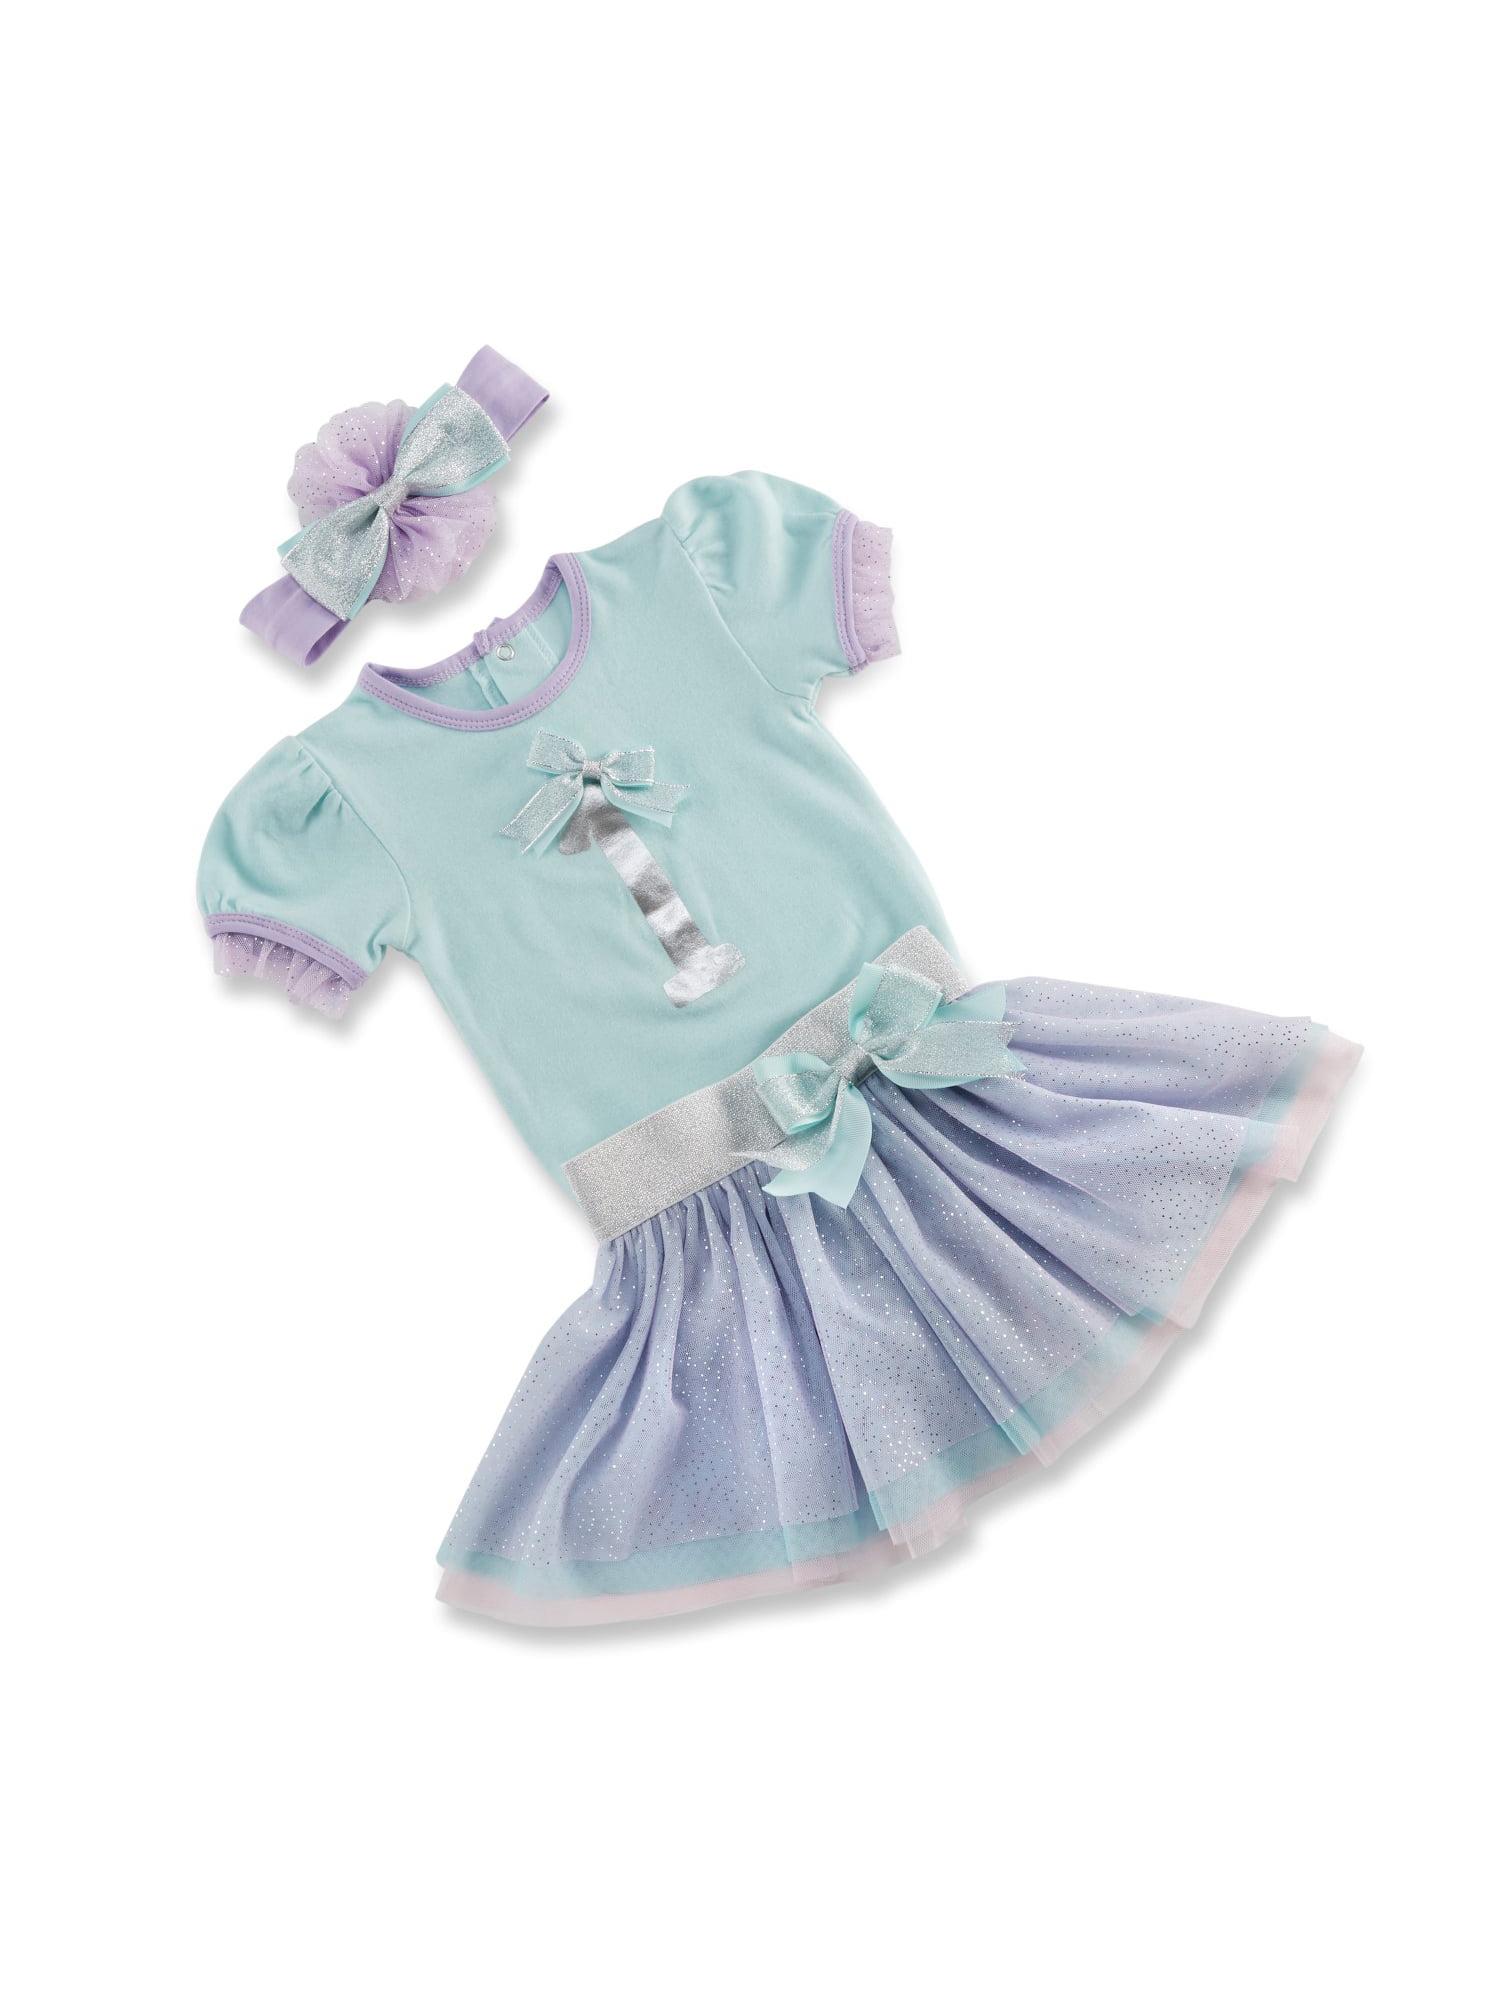 Baby Aspen My First Birthday Short Sleeve Bodysuit, Tutu Skirt & Headband, 3pc Outfit Set (Baby Girls) 12mo.